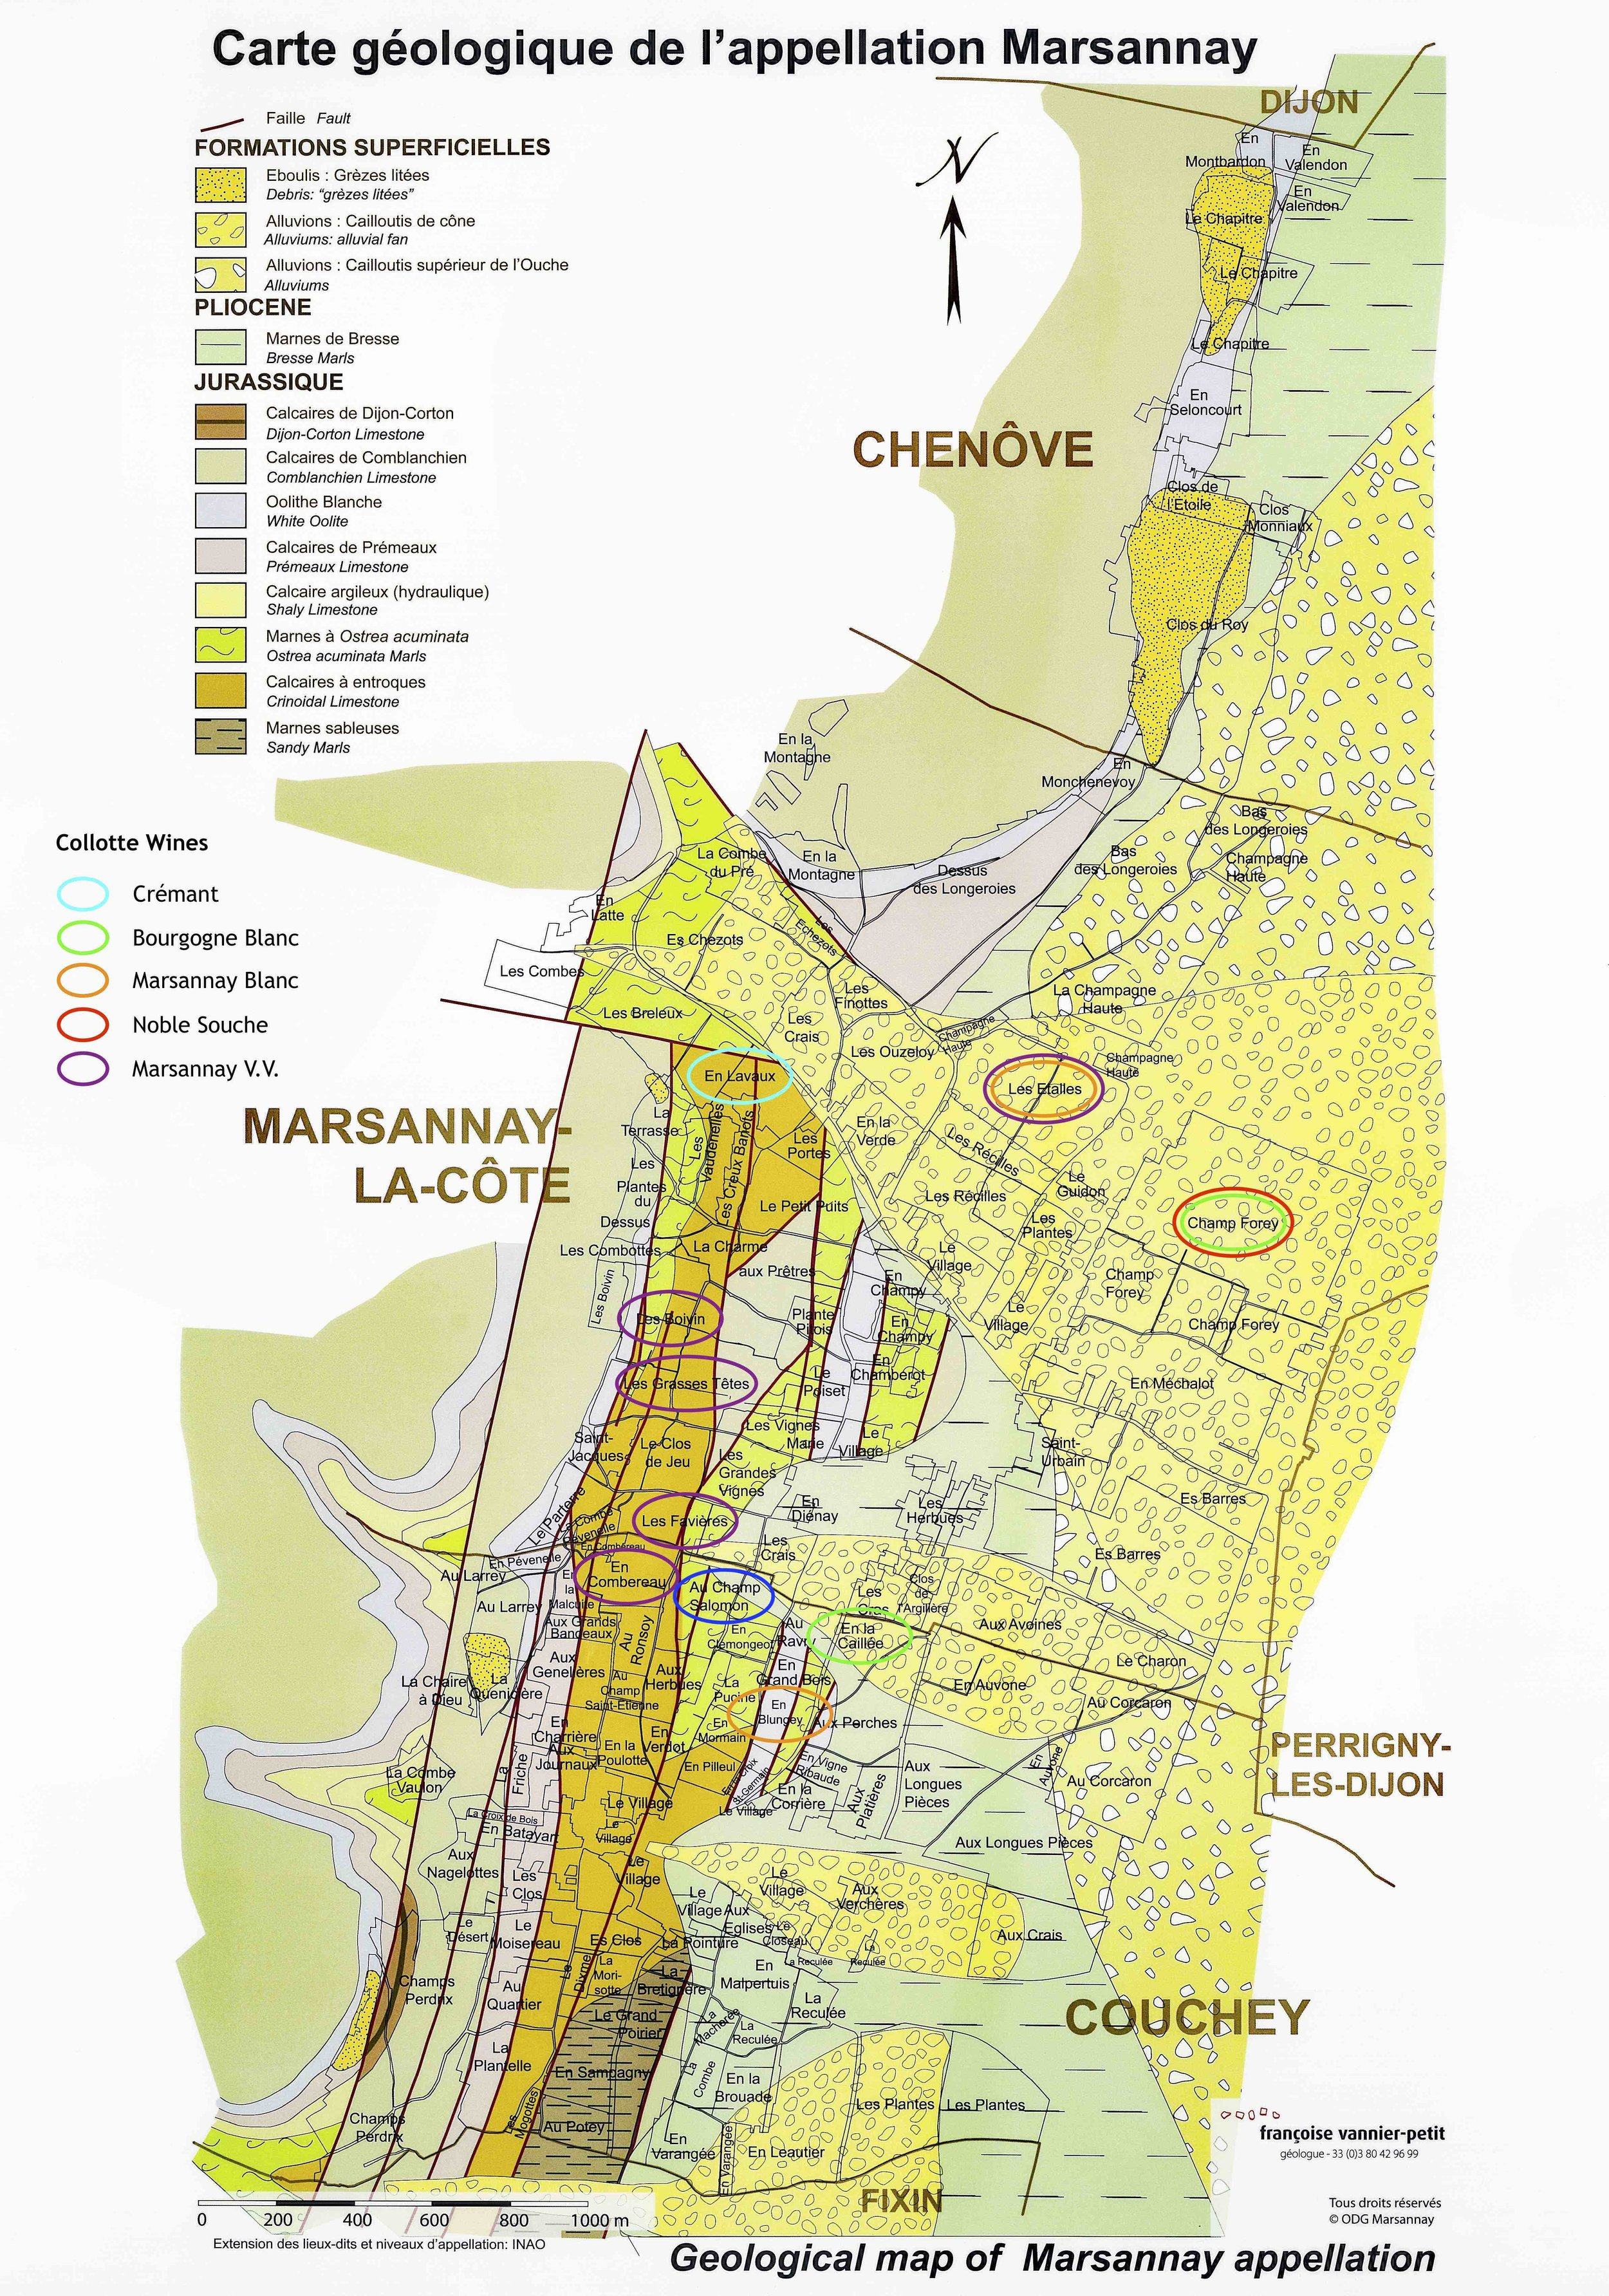 Soils of Marsannay